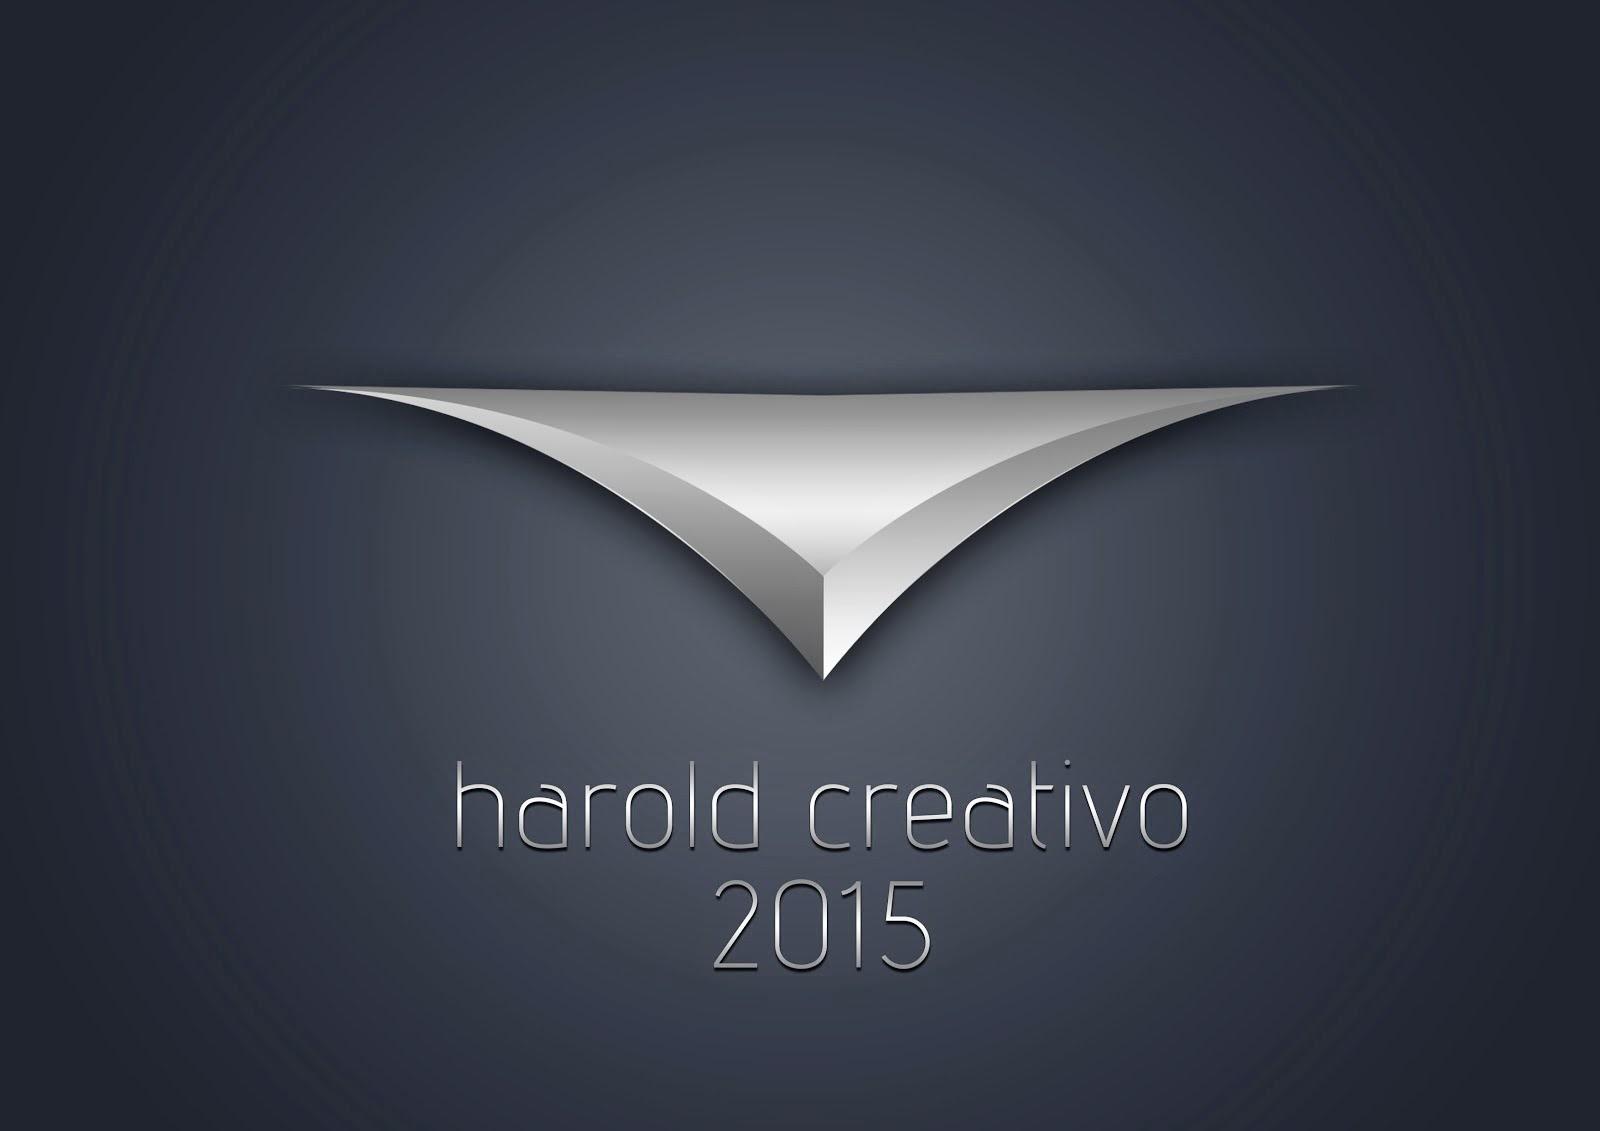 HaroldCreativo